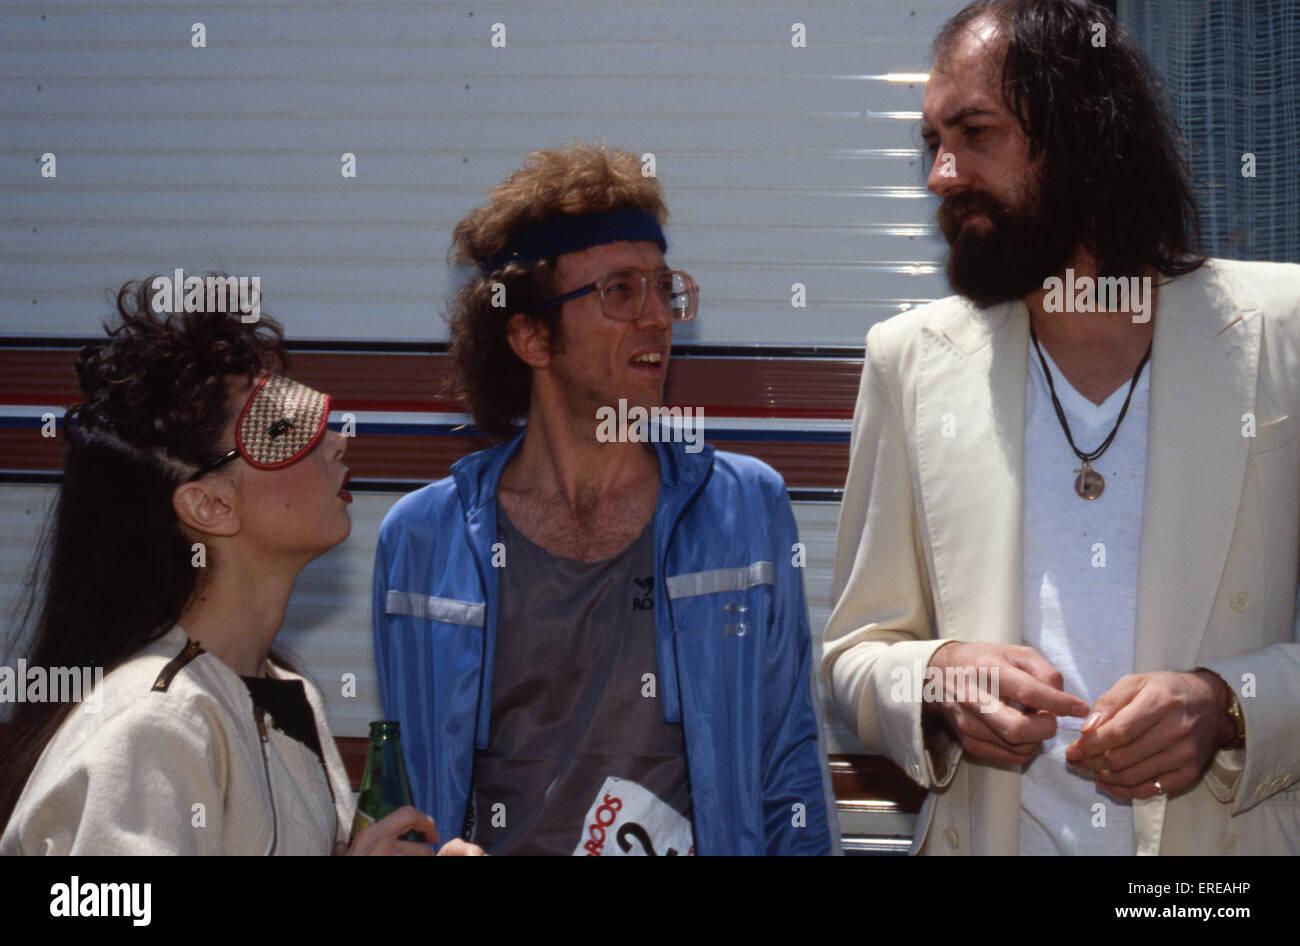 Toni Basil, Bob Welch and Mick Fleetwood in Los Angeles, USA. Toni Basil, American dancer, choreographer, actress - Stock Image